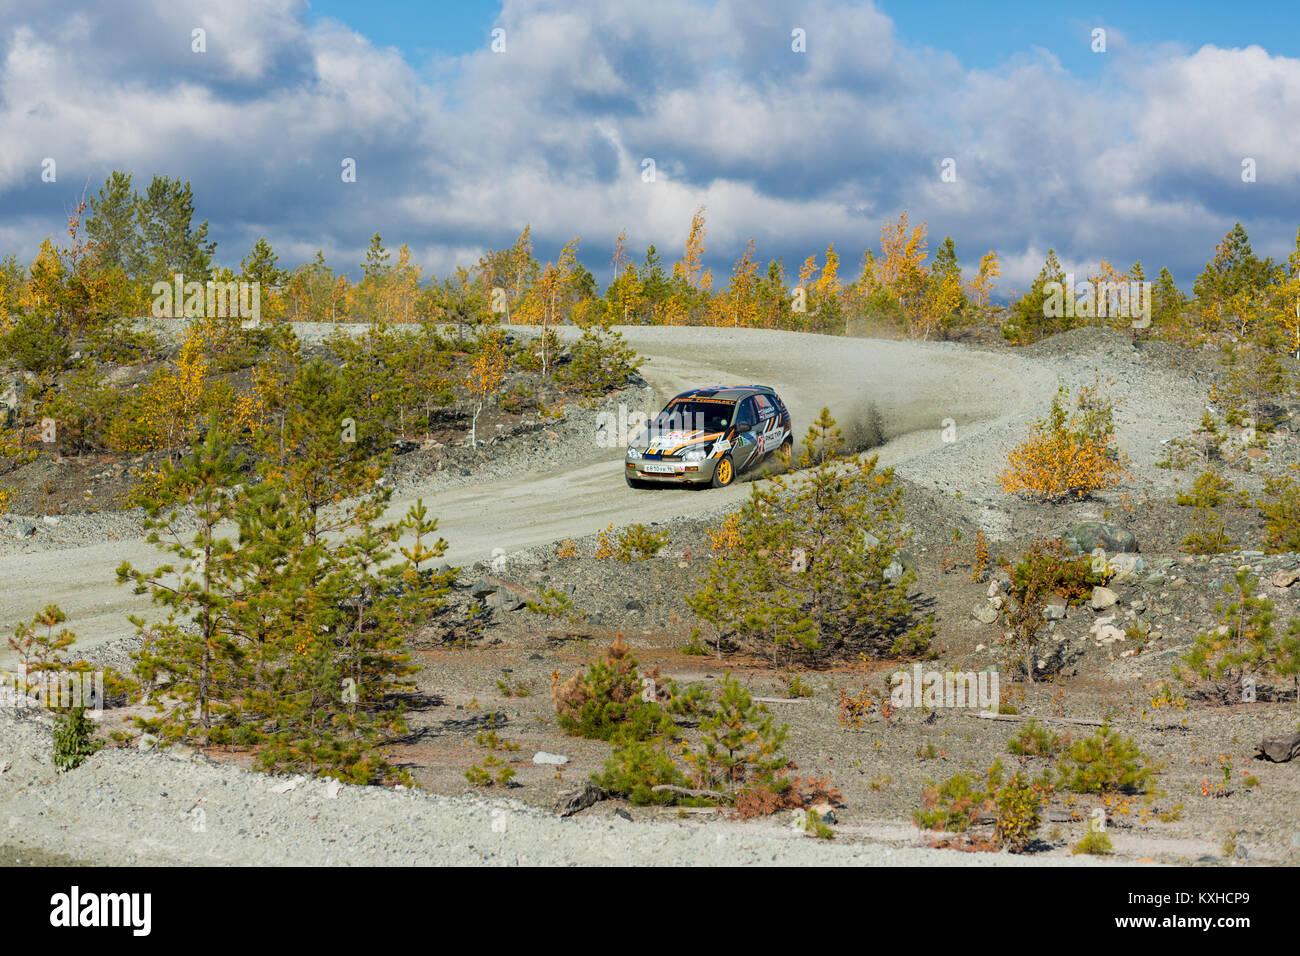 Asbest, Russland, September 17, 2017 - 16 Phase der Russischen Cup rally'S 2017 tilobite 2017', Auto Lada Stockbild